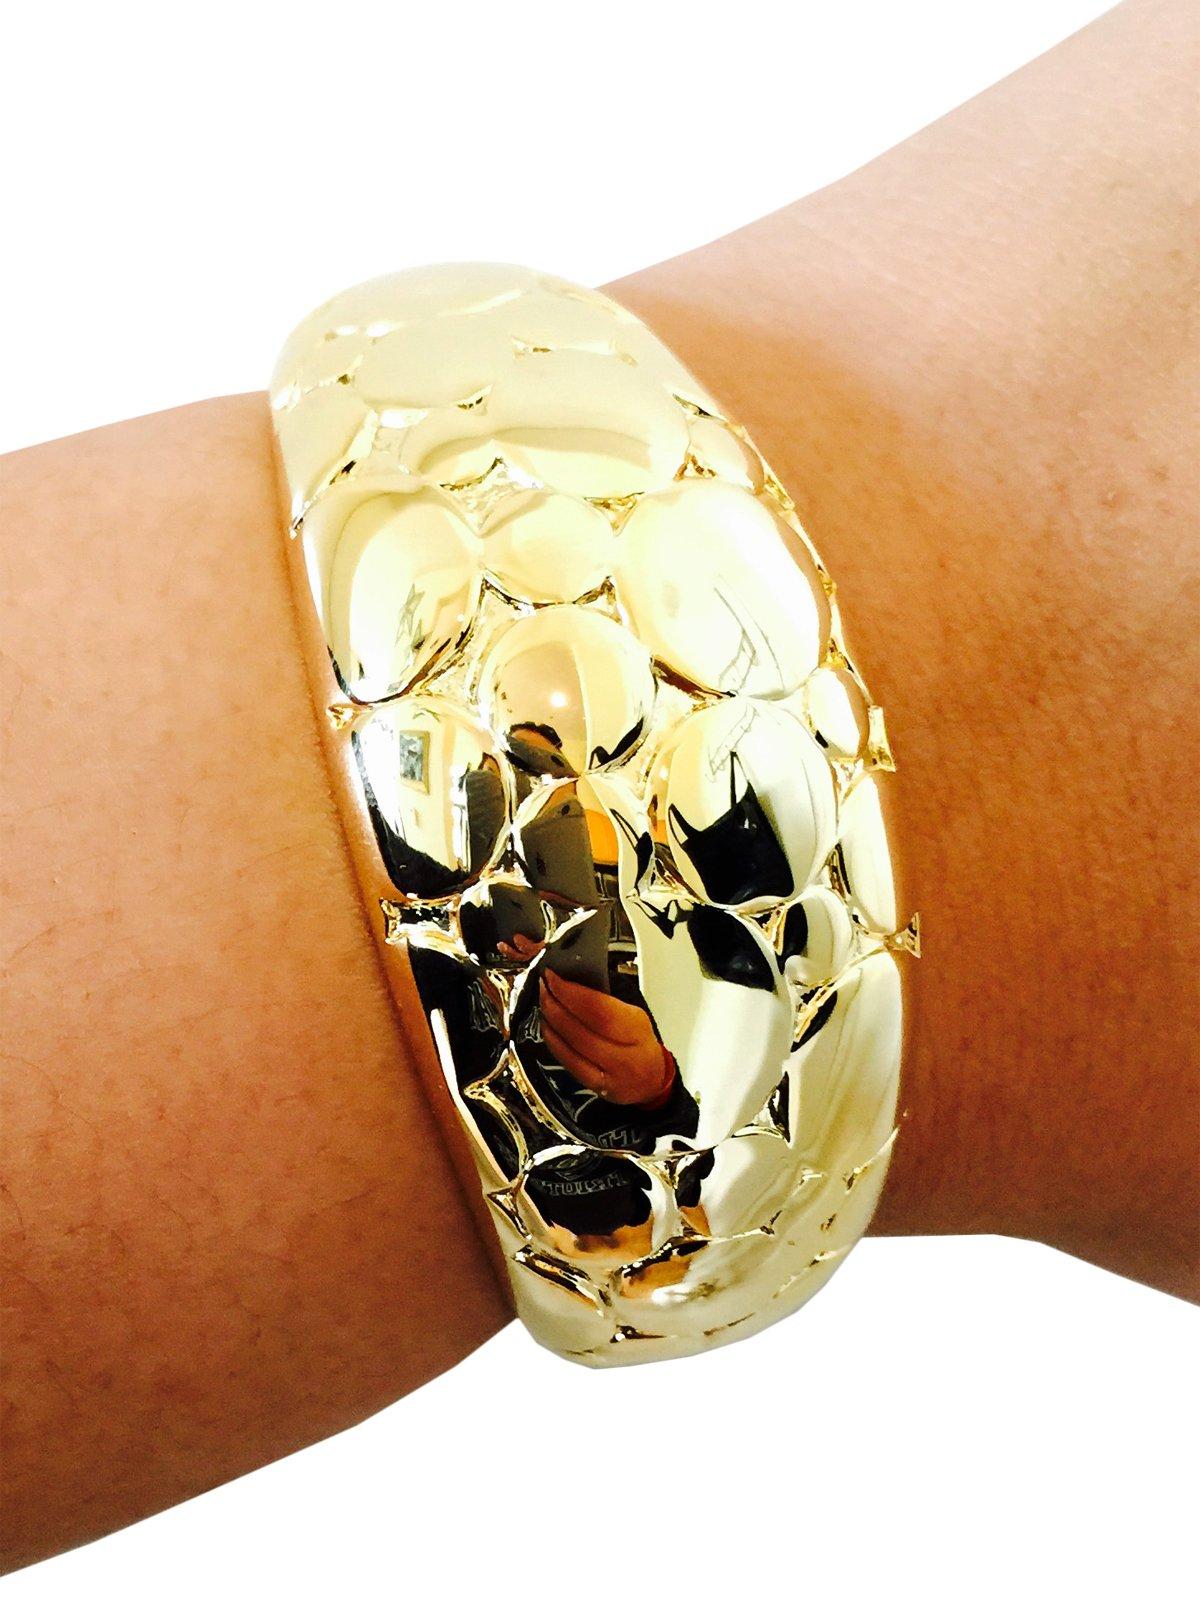 Fitbit Bracelet for FitBit Flex Activity Tracker - The JUANITA Hinge Bangle Fitbit Bracelet (Gold)